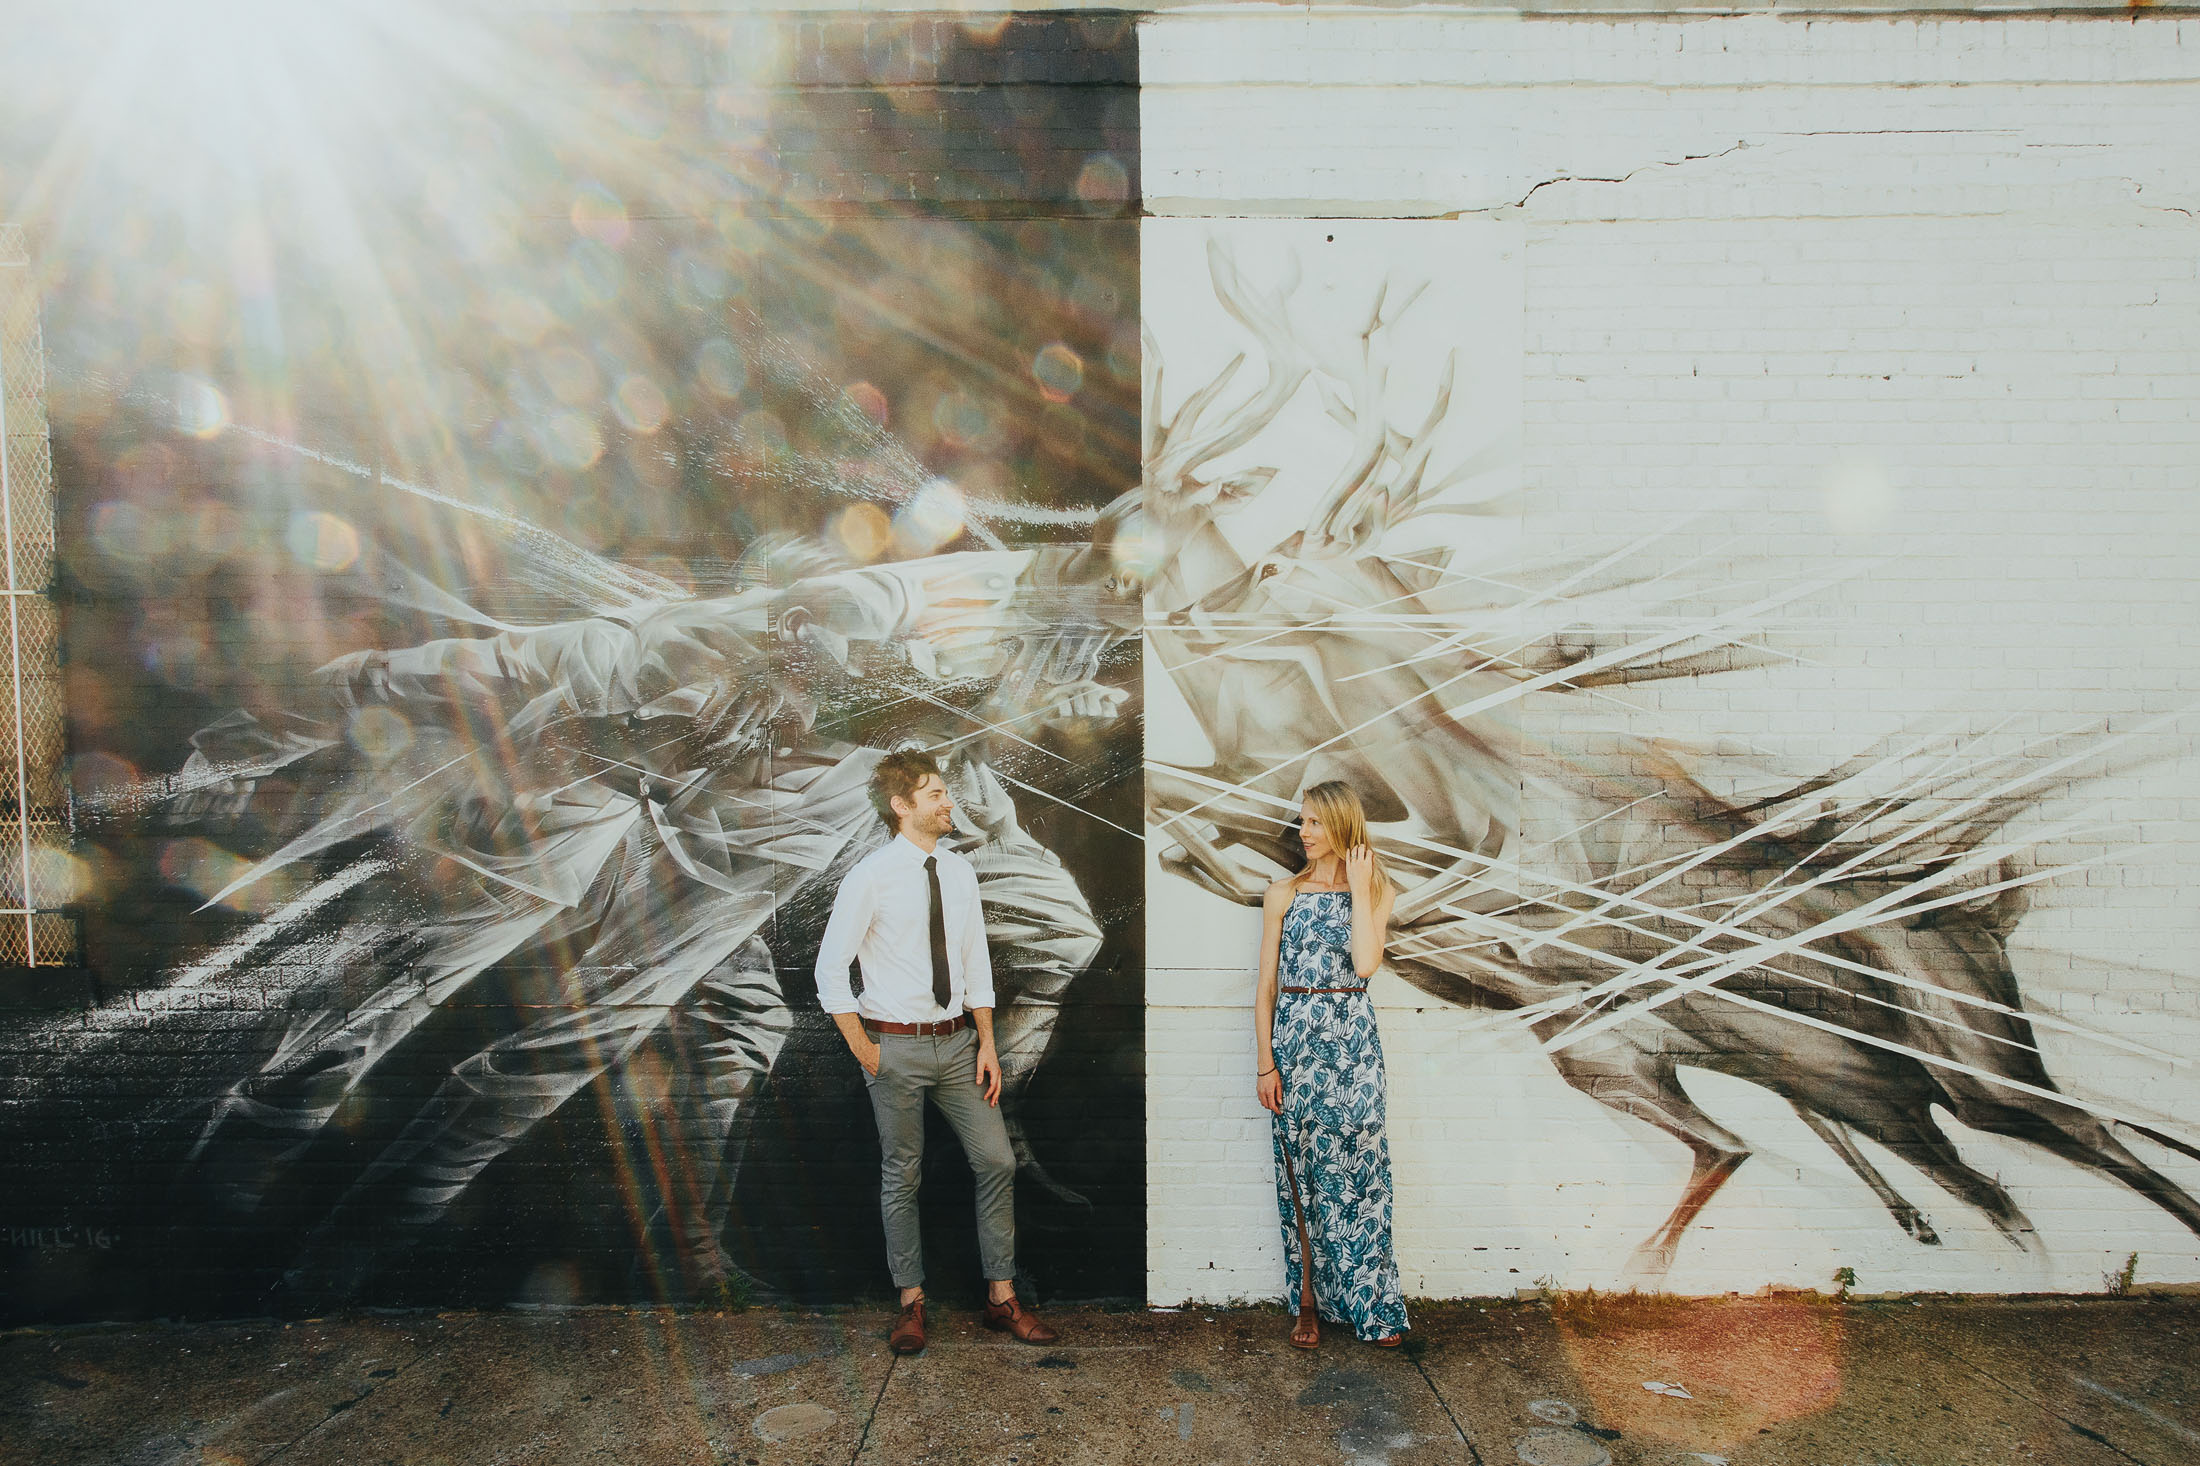 16 finch and oak engagement wedding photographer gold coast new york brooklyn.jpg